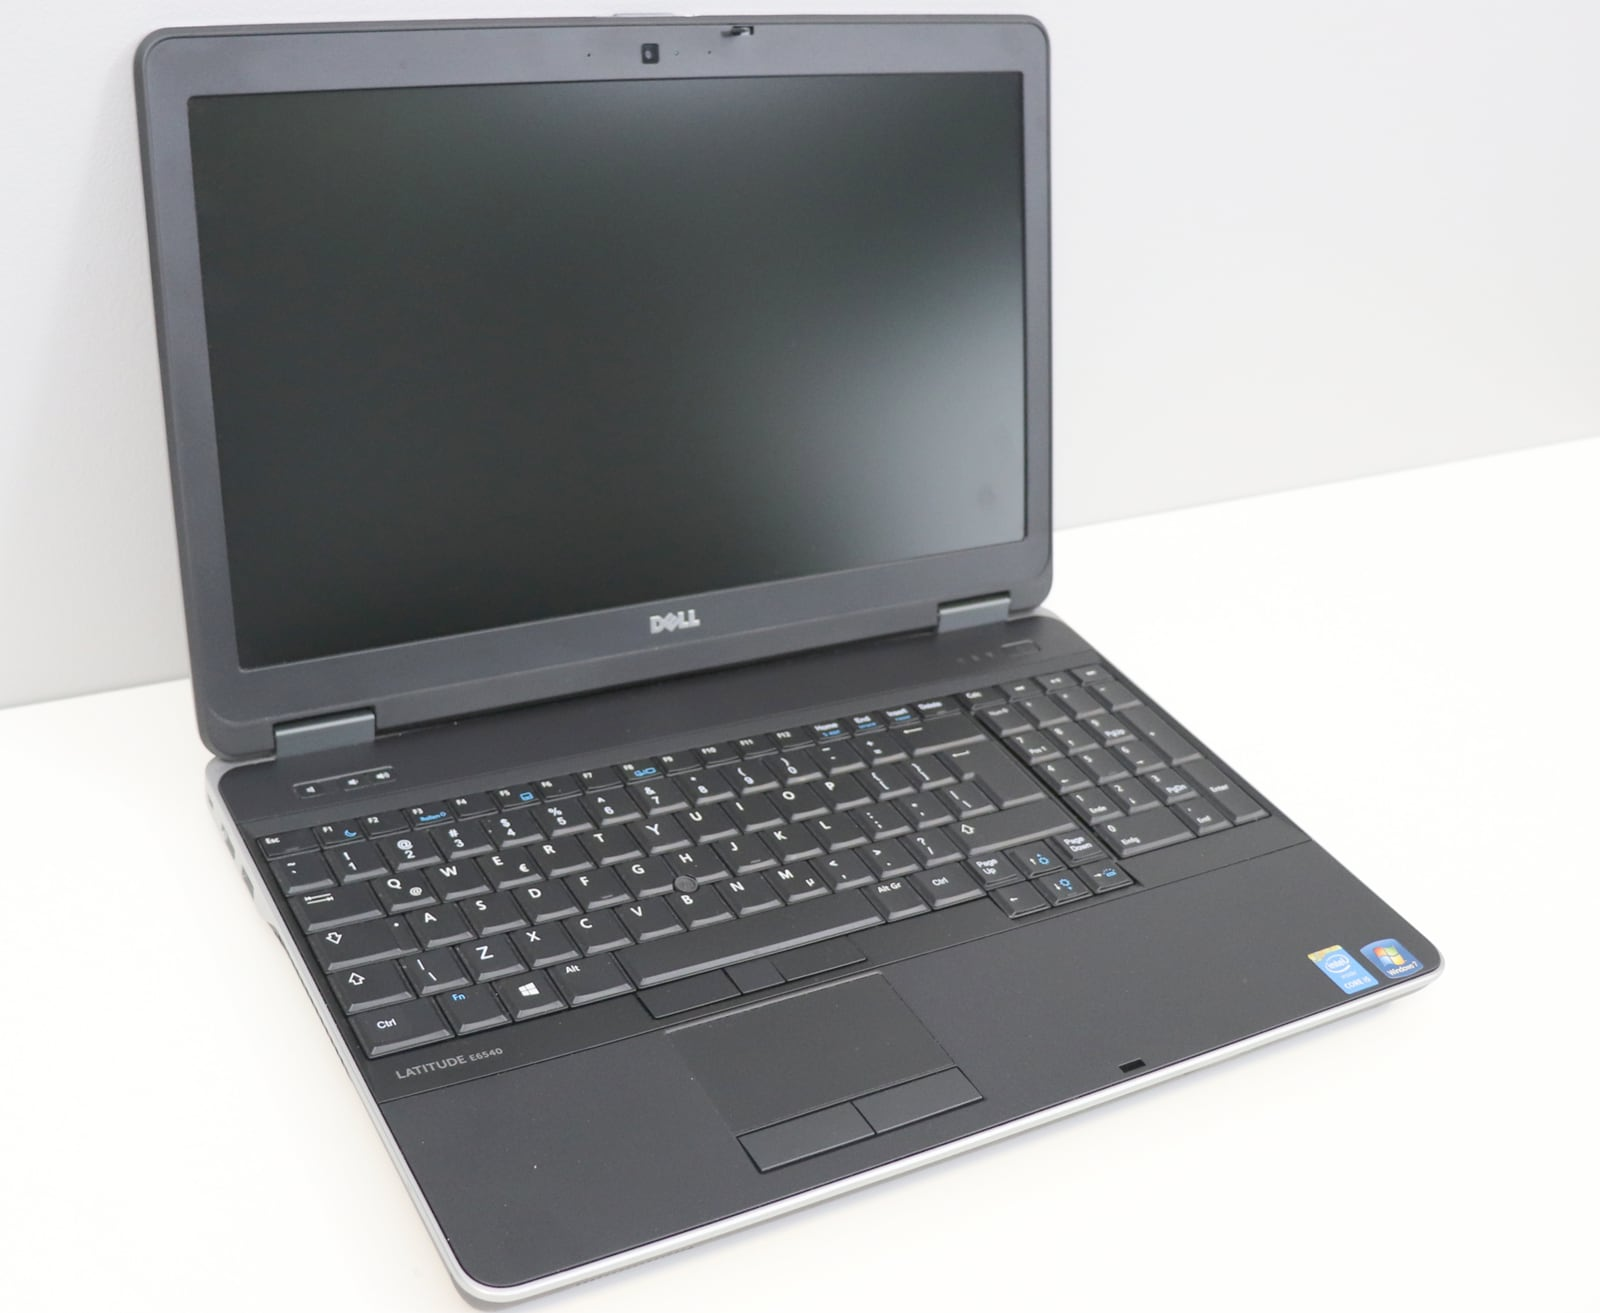 Laptop Dell Latitude E6540 i7 - 4 generacji / 16GB / 240 GB SSD / 15,6 HD / Klasa A- - 3